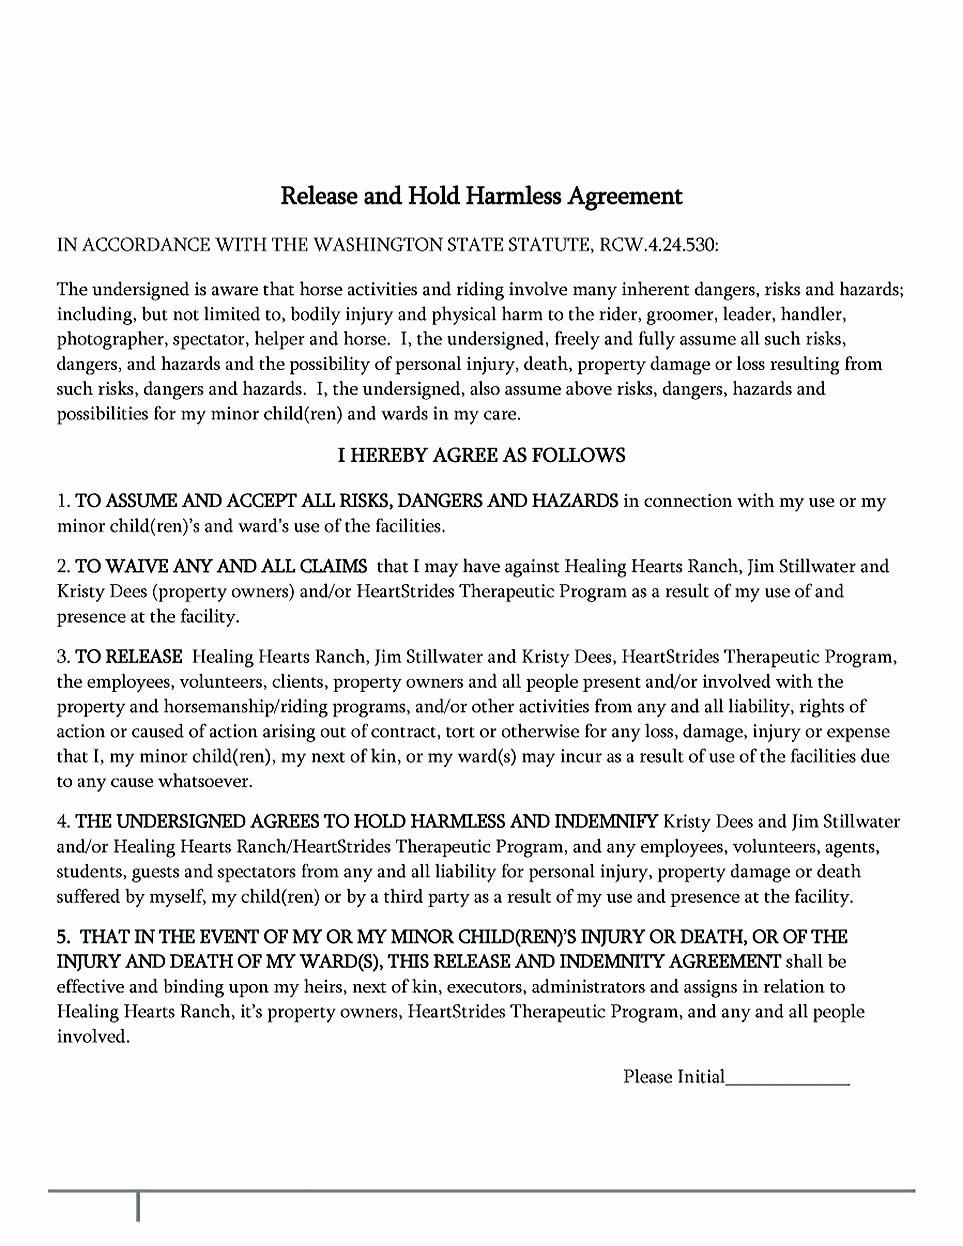 Hold Harmless Agreement Sample Wording Luxury Making Hold Harmless Agreement Template for Different Purposes